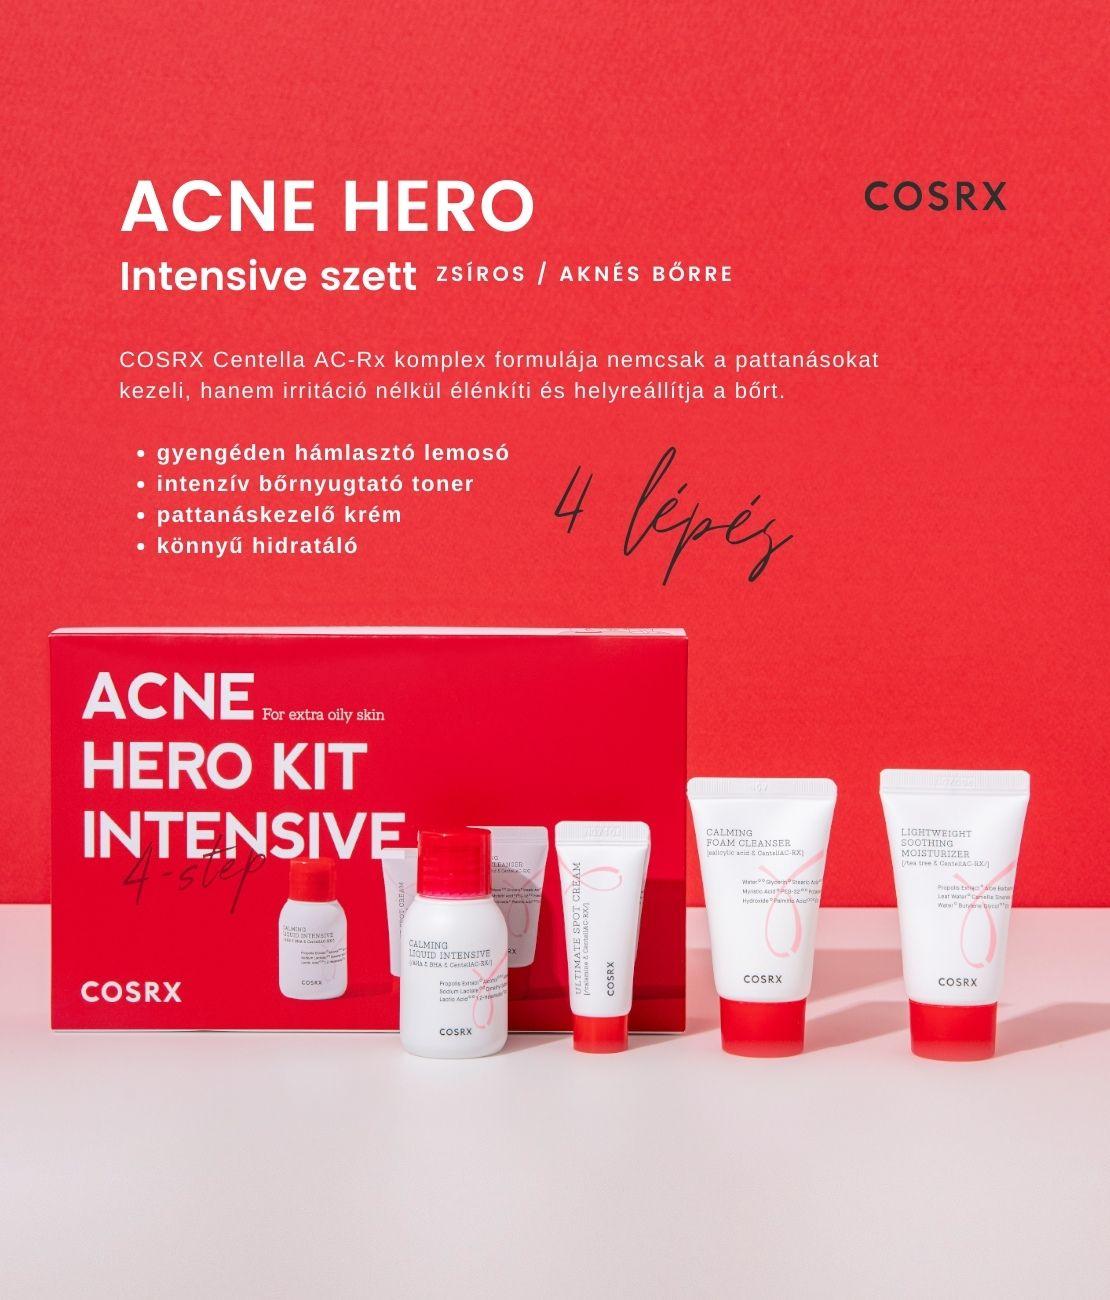 COSRX-Acne-hero-intensive-szett